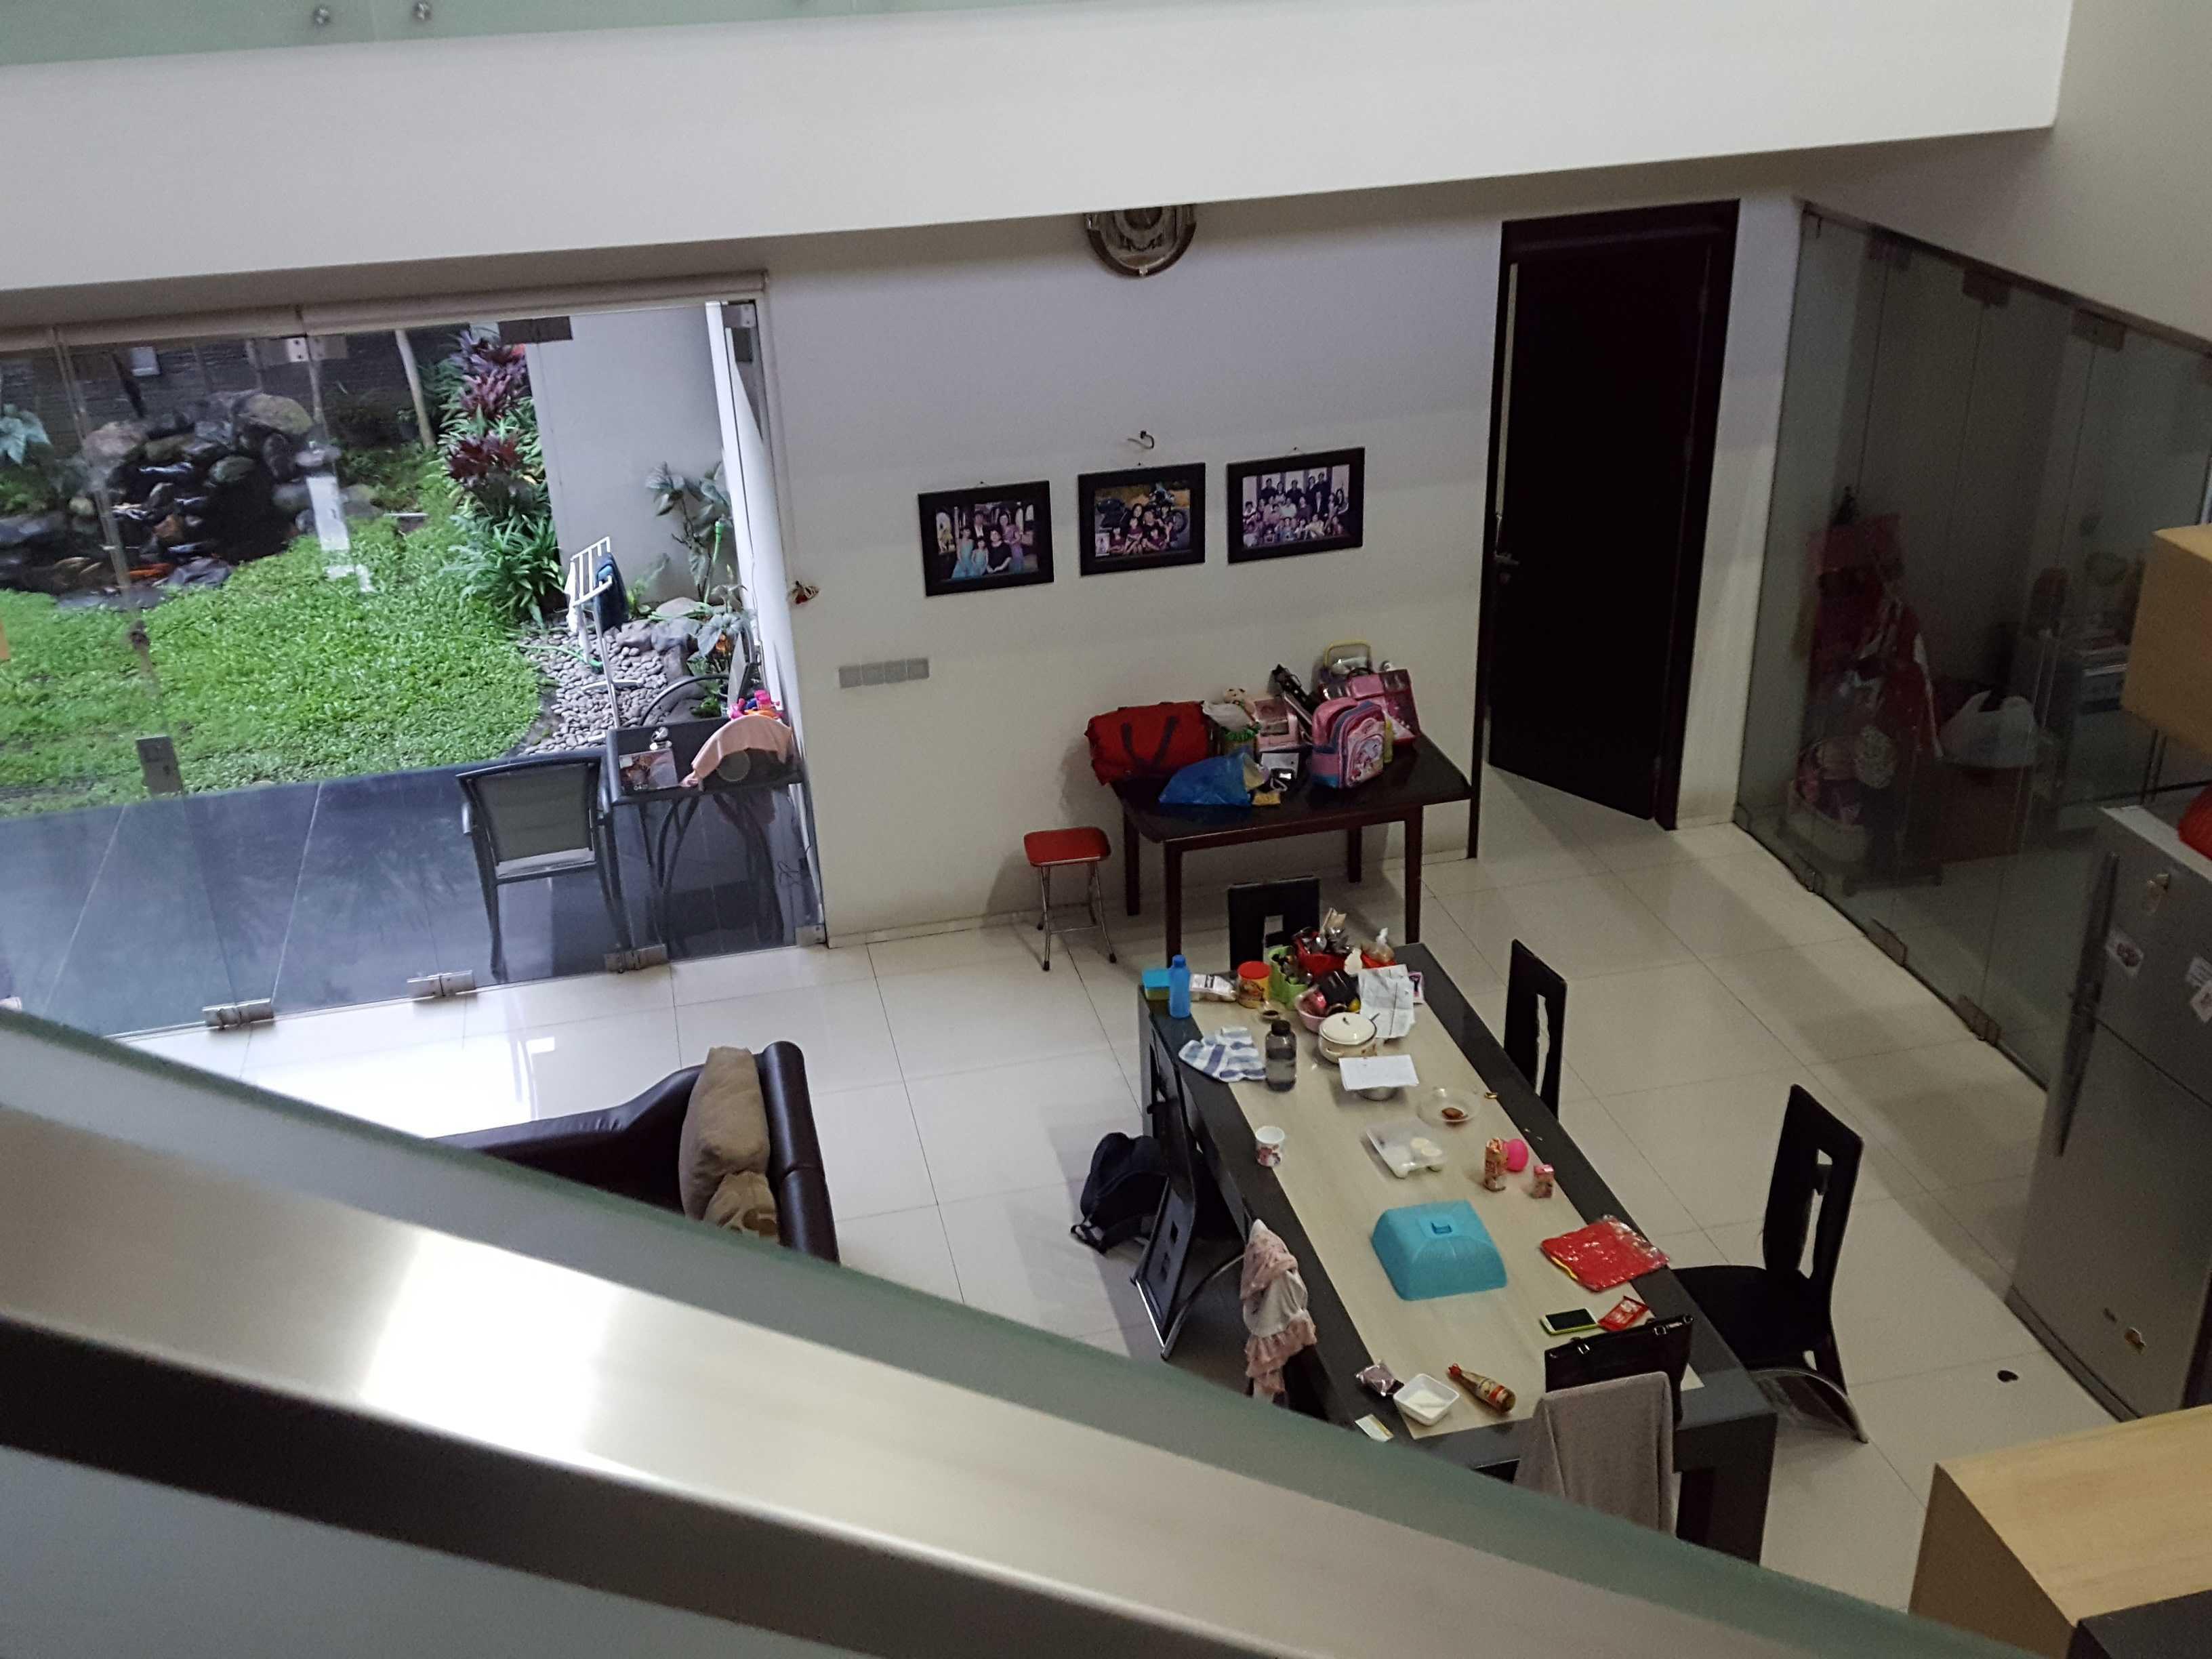 Christianto Hendrawan Rw House Bandung City, West Java, Indonesia Bandung City, West Java, Indonesia 20160526164729 Modern  35242